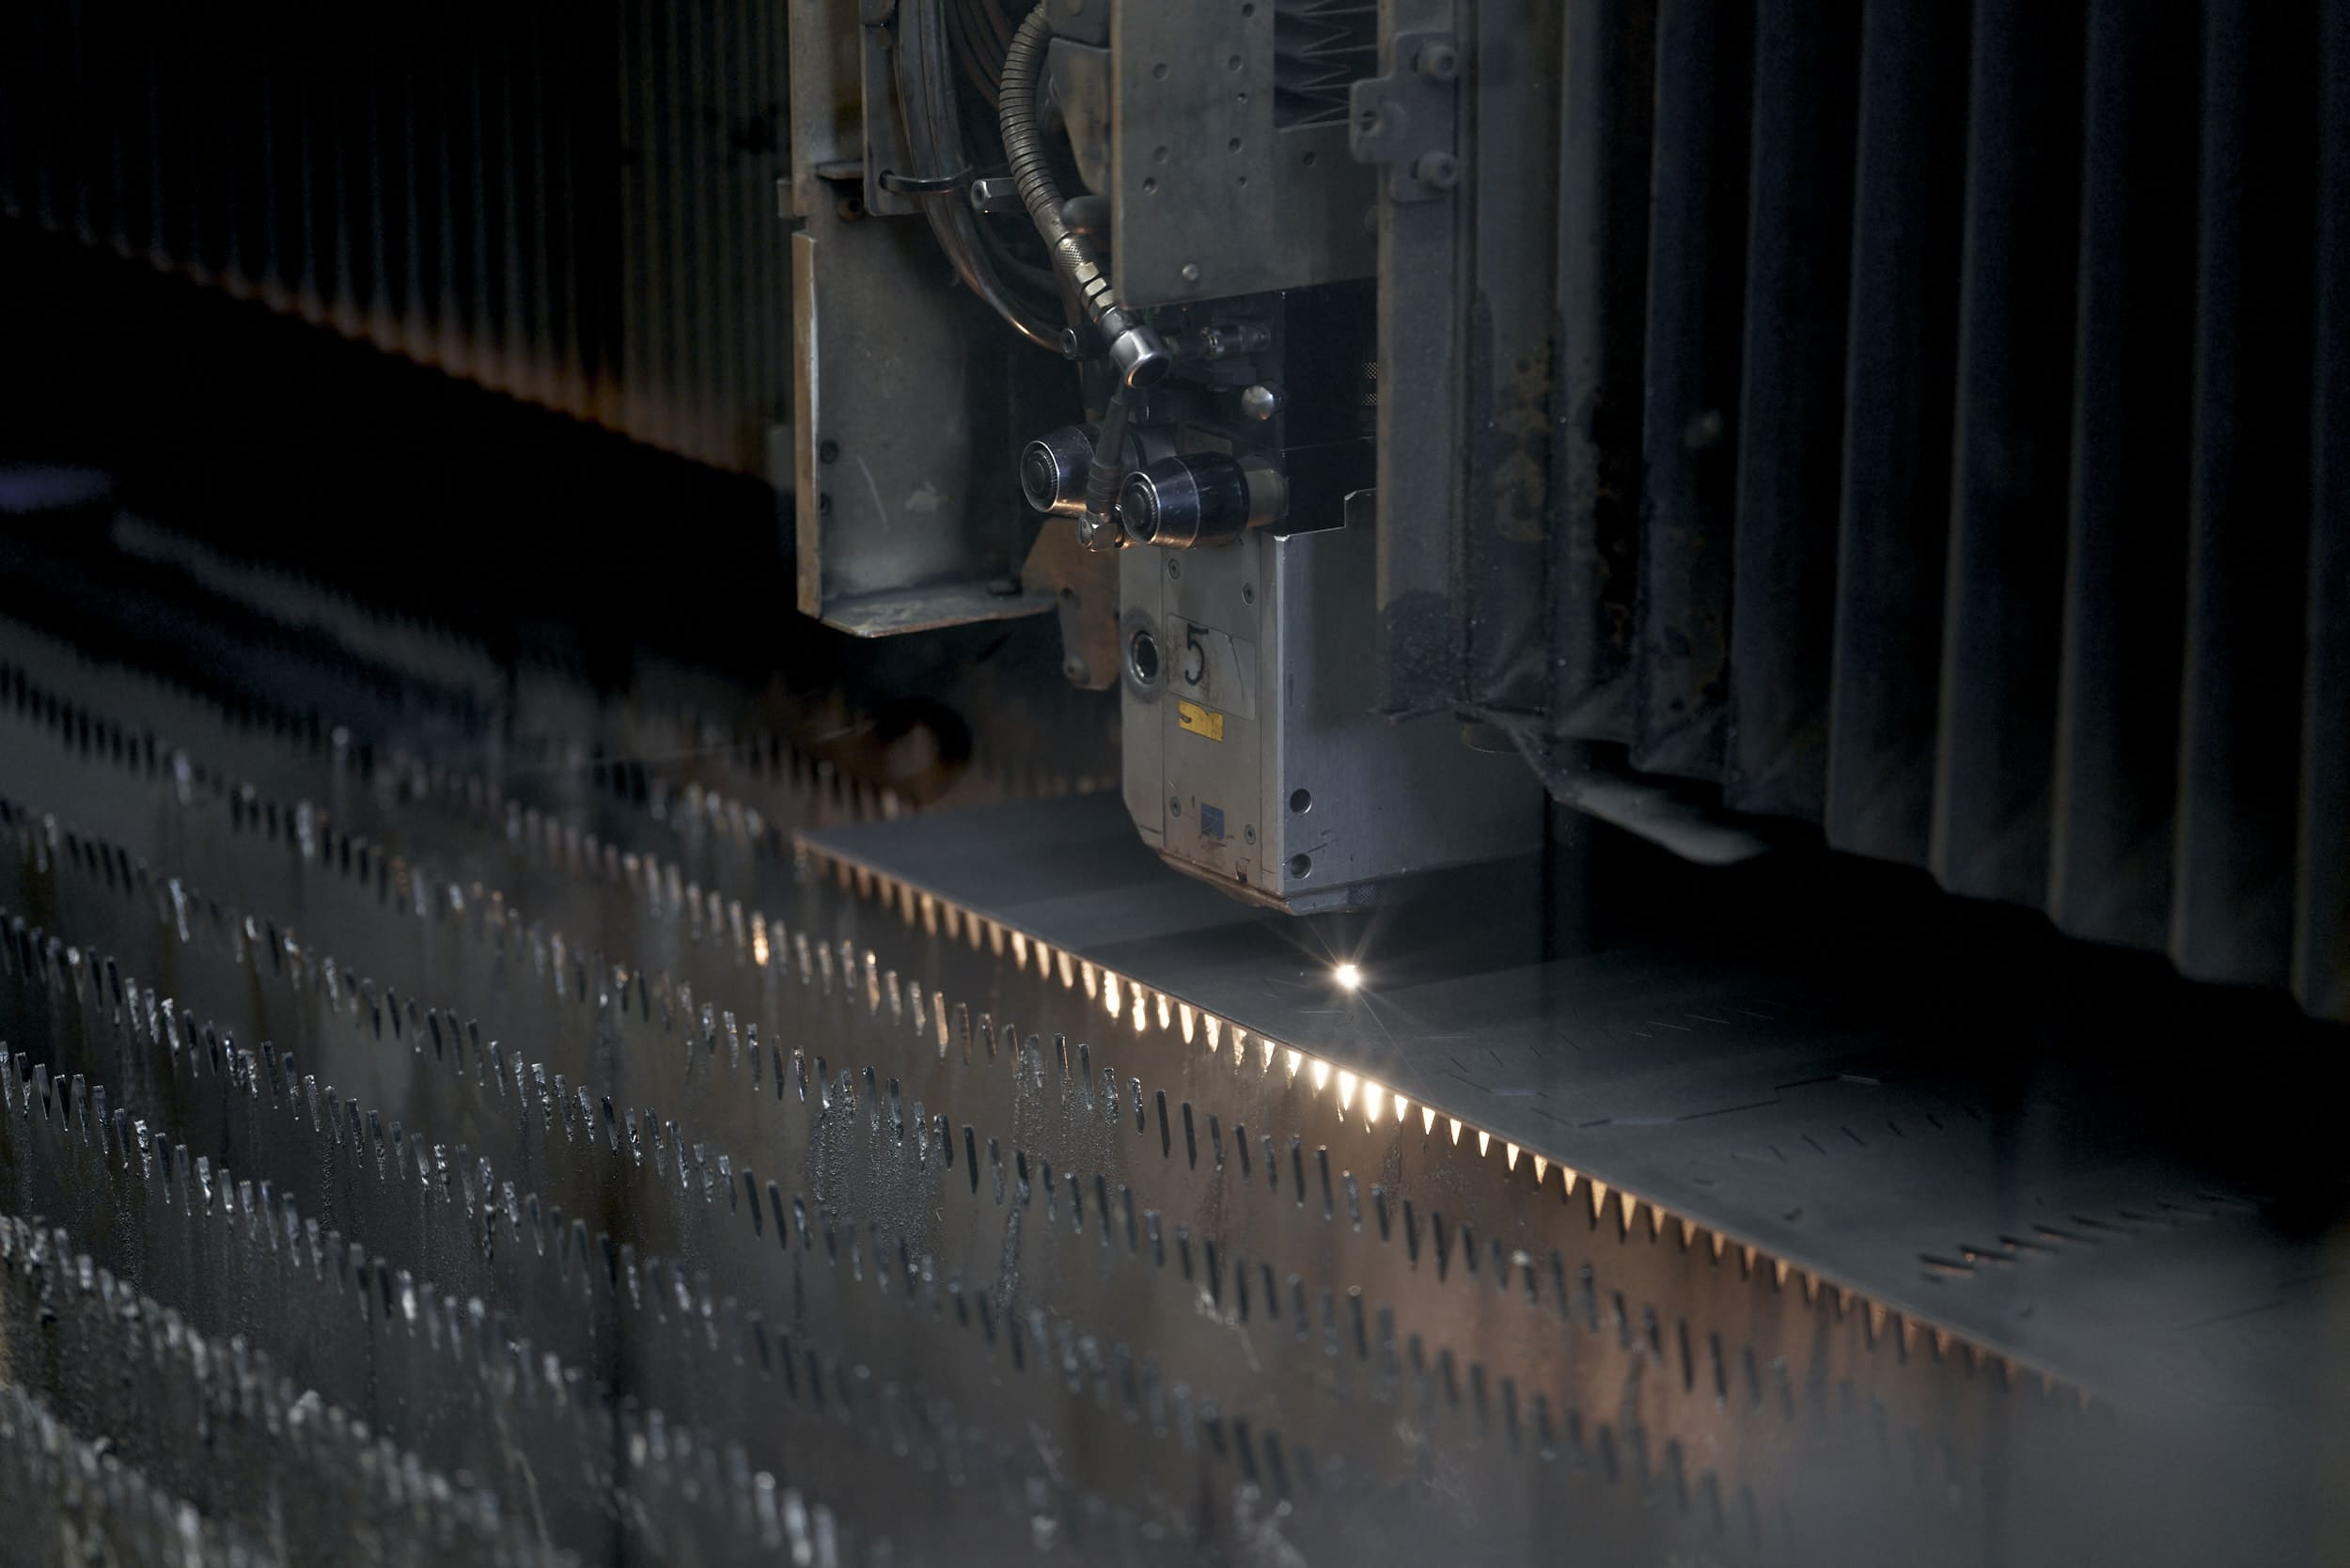 Laserschneiden Keyvisual: Laserschneidmaschiene, Blechzuschnitt Prozess